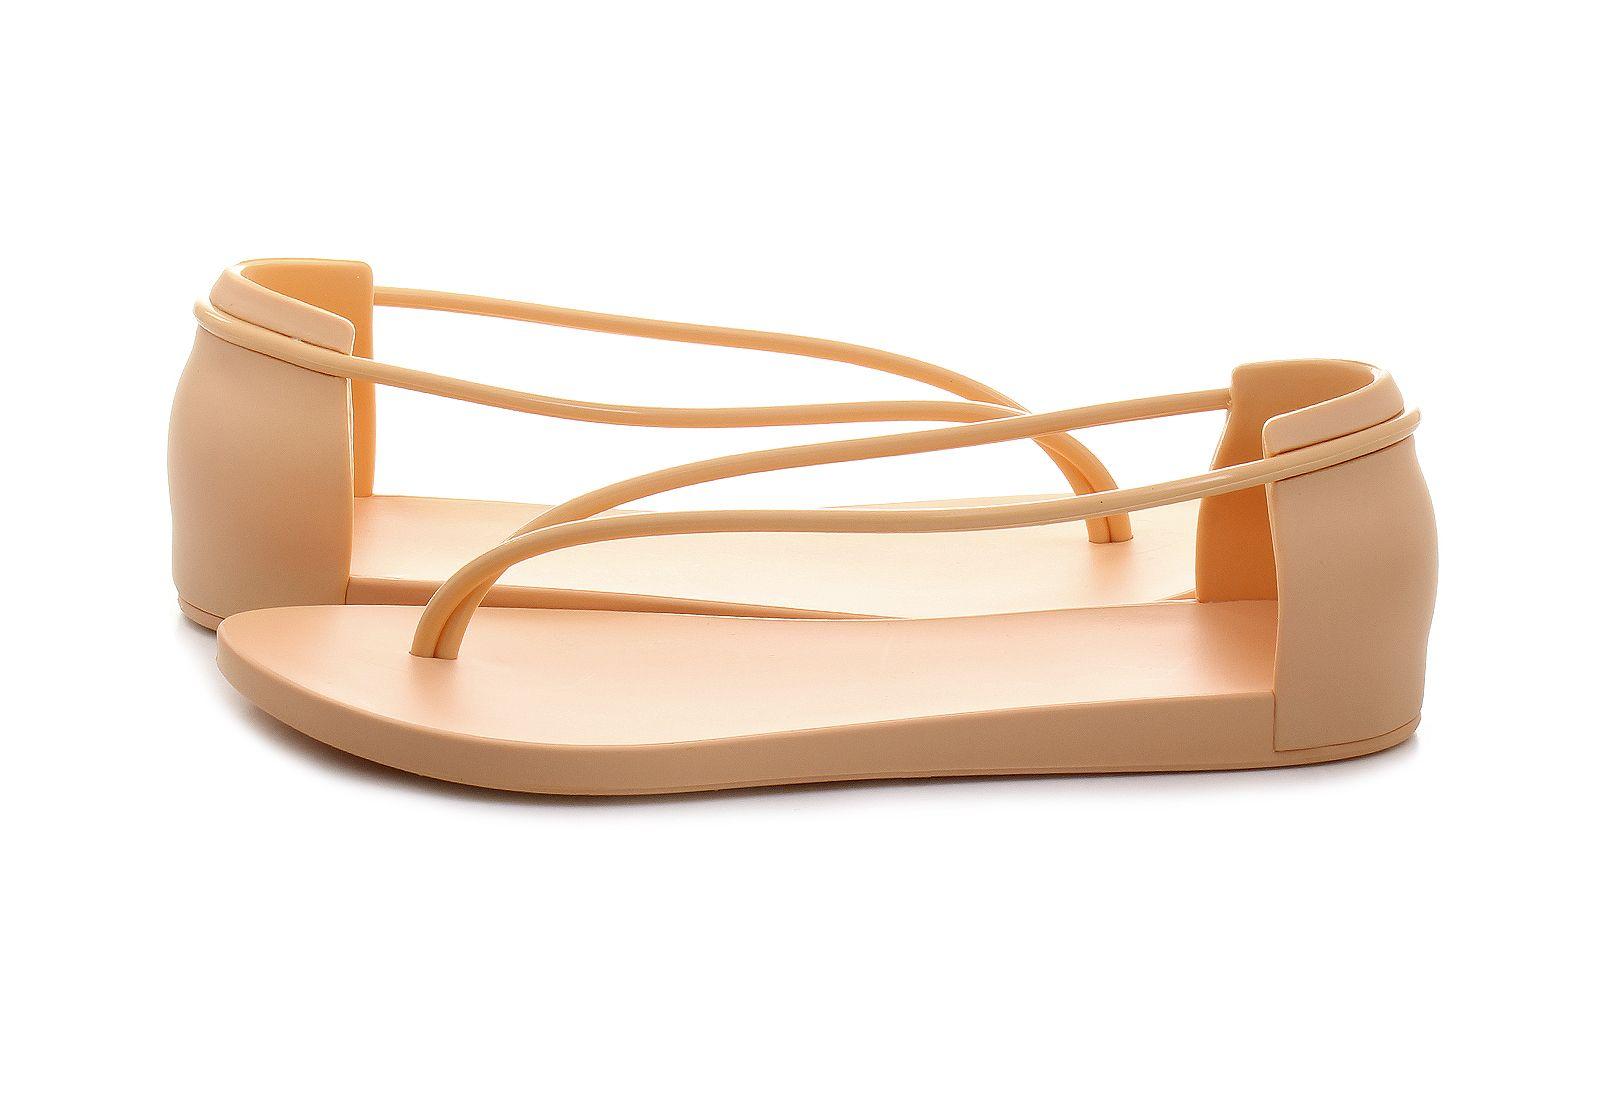 c859d9d76445 Ipanema Sandals - Philippe Starck Thing N - 82047-24421 - Online ...